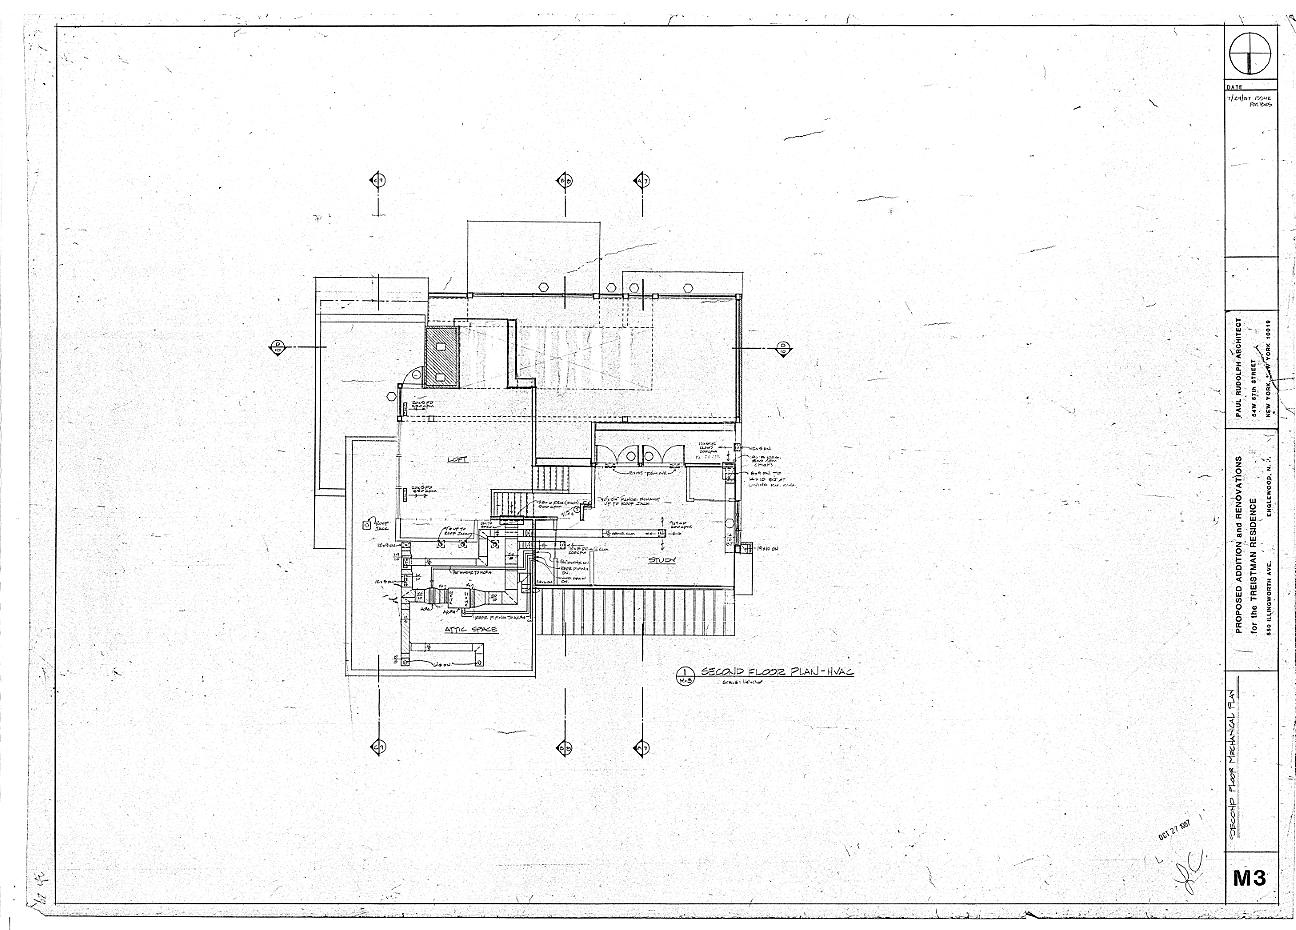 Residence for Mr. and Mrs. Treistman, Englewood, New Jersey.  Loft Level, Sheet M3.